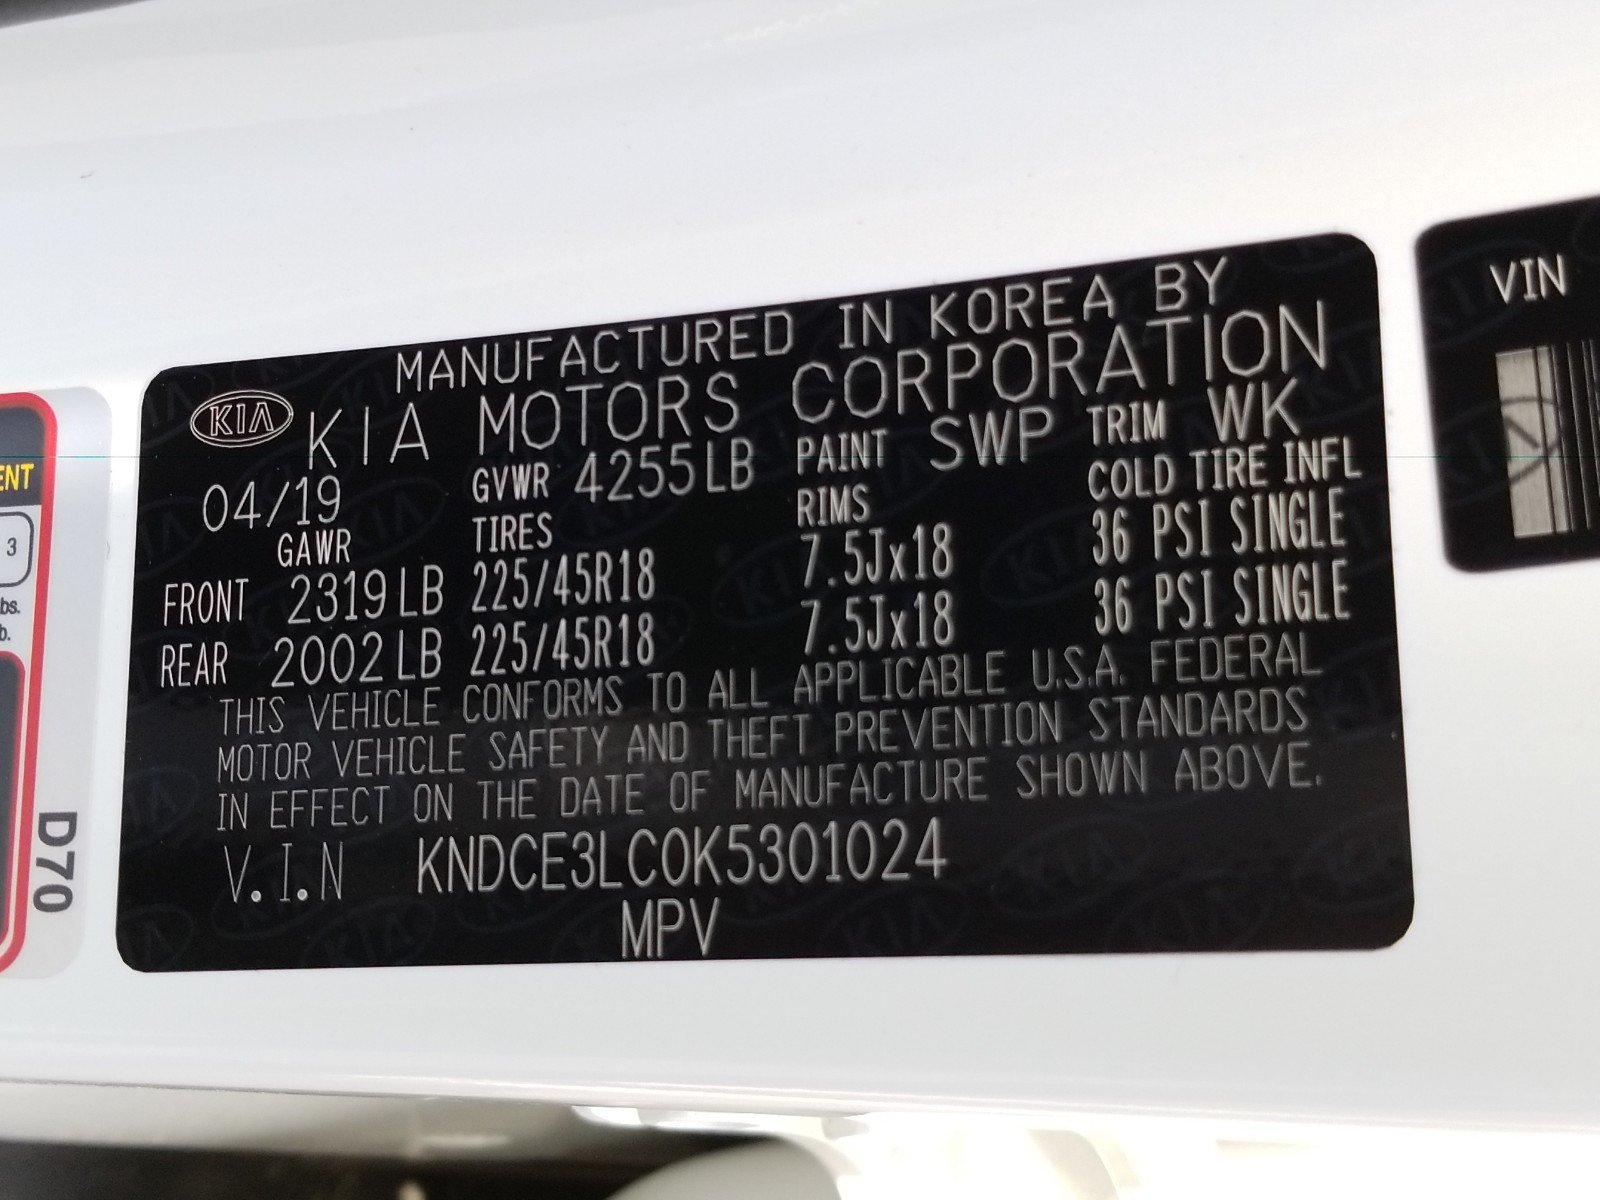 New 2019 Kia Niro For Sale at Crown Kia | VIN: KNDCE3LC0K5301024